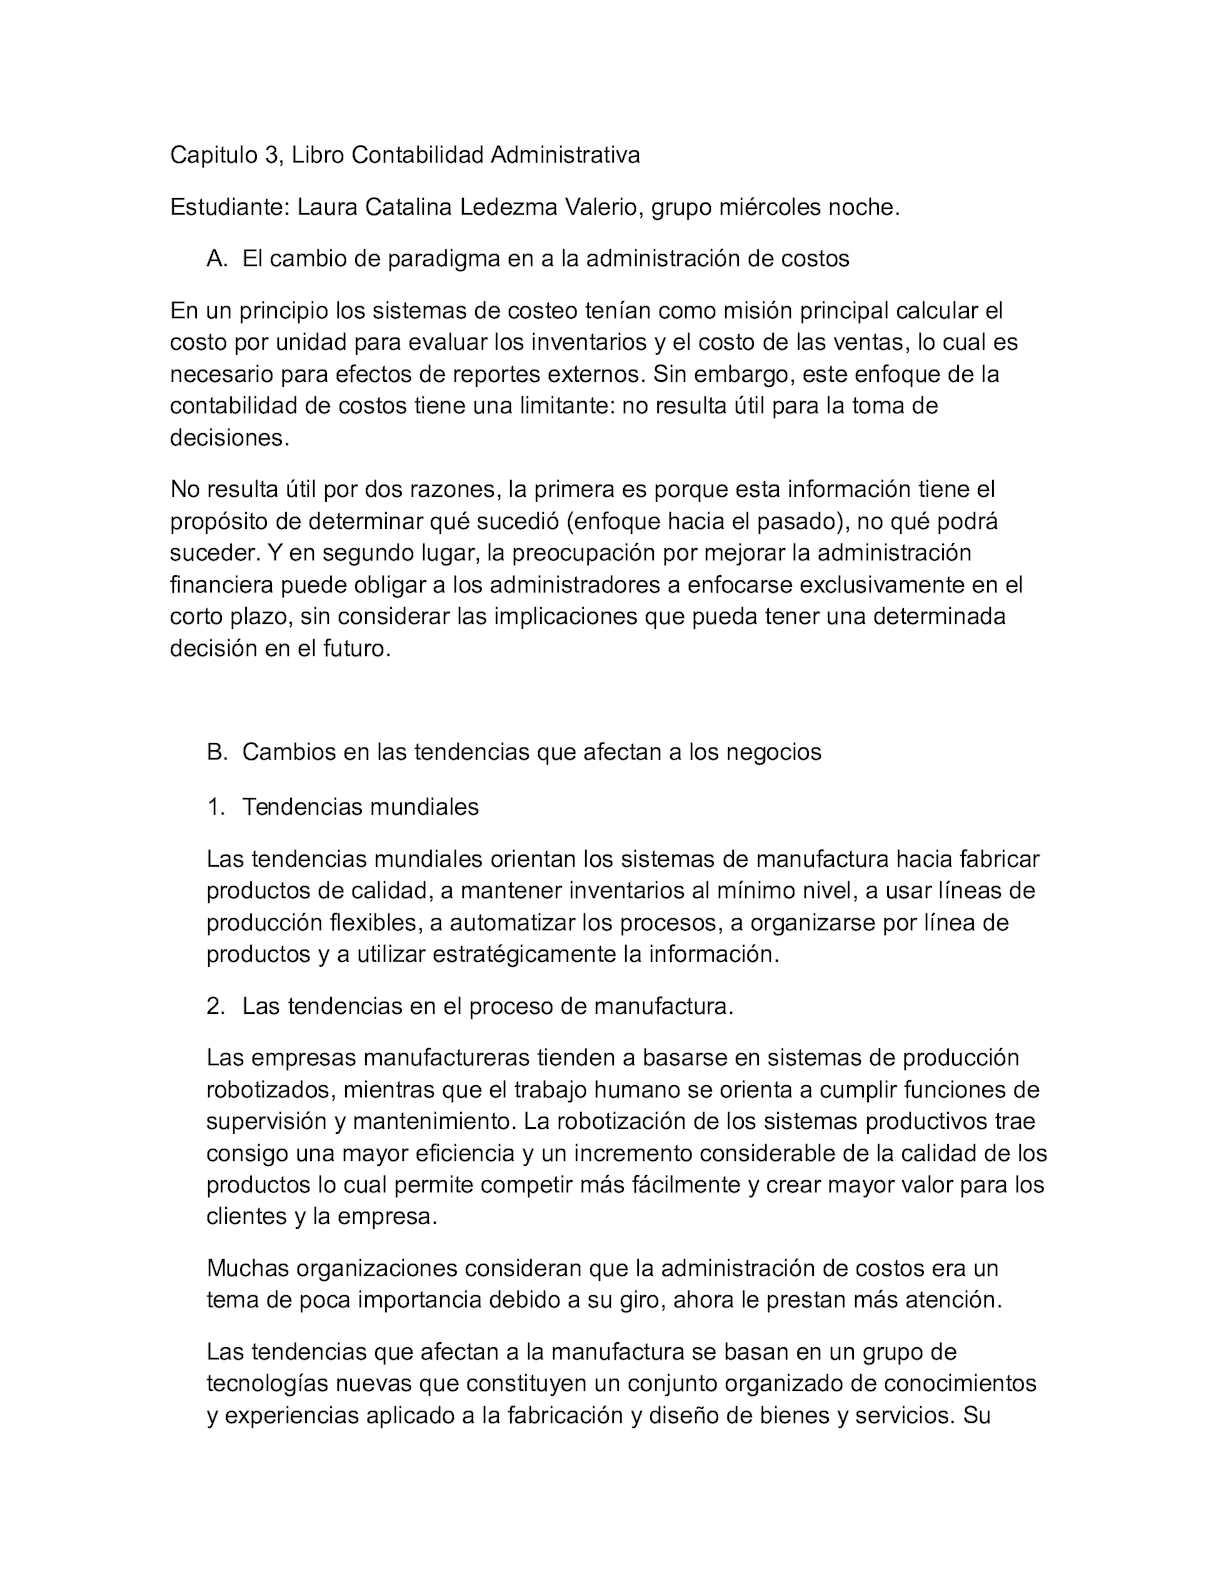 Calaméo - Resumen Capitulo 3 Contabilidad Administrativa